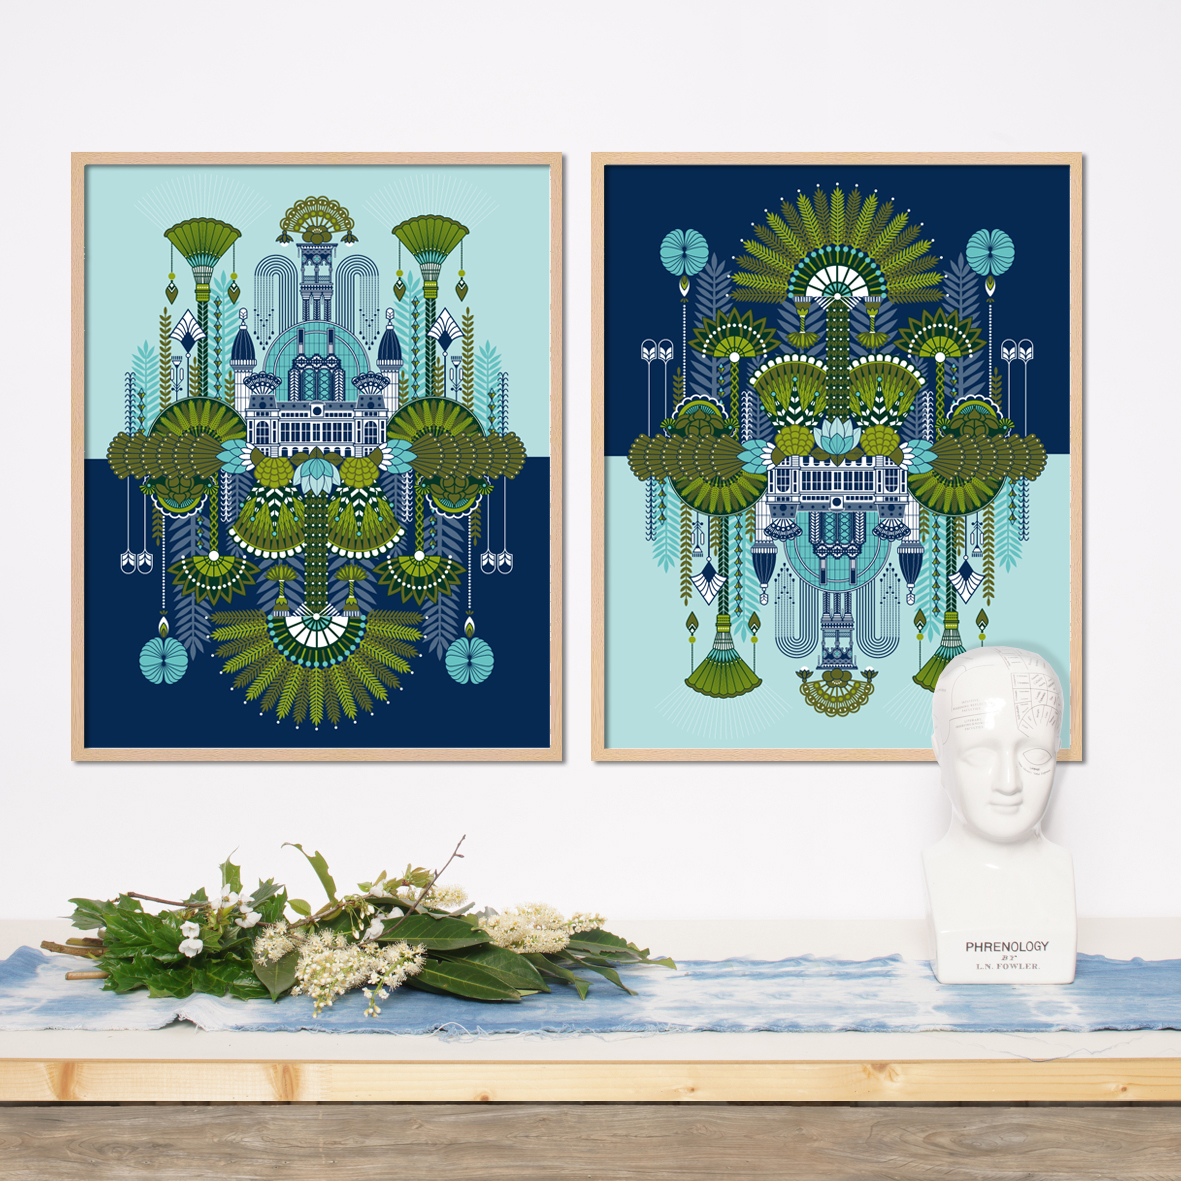 Versus, Temple of Nature  - Digitale illustration, silk screen print   2018